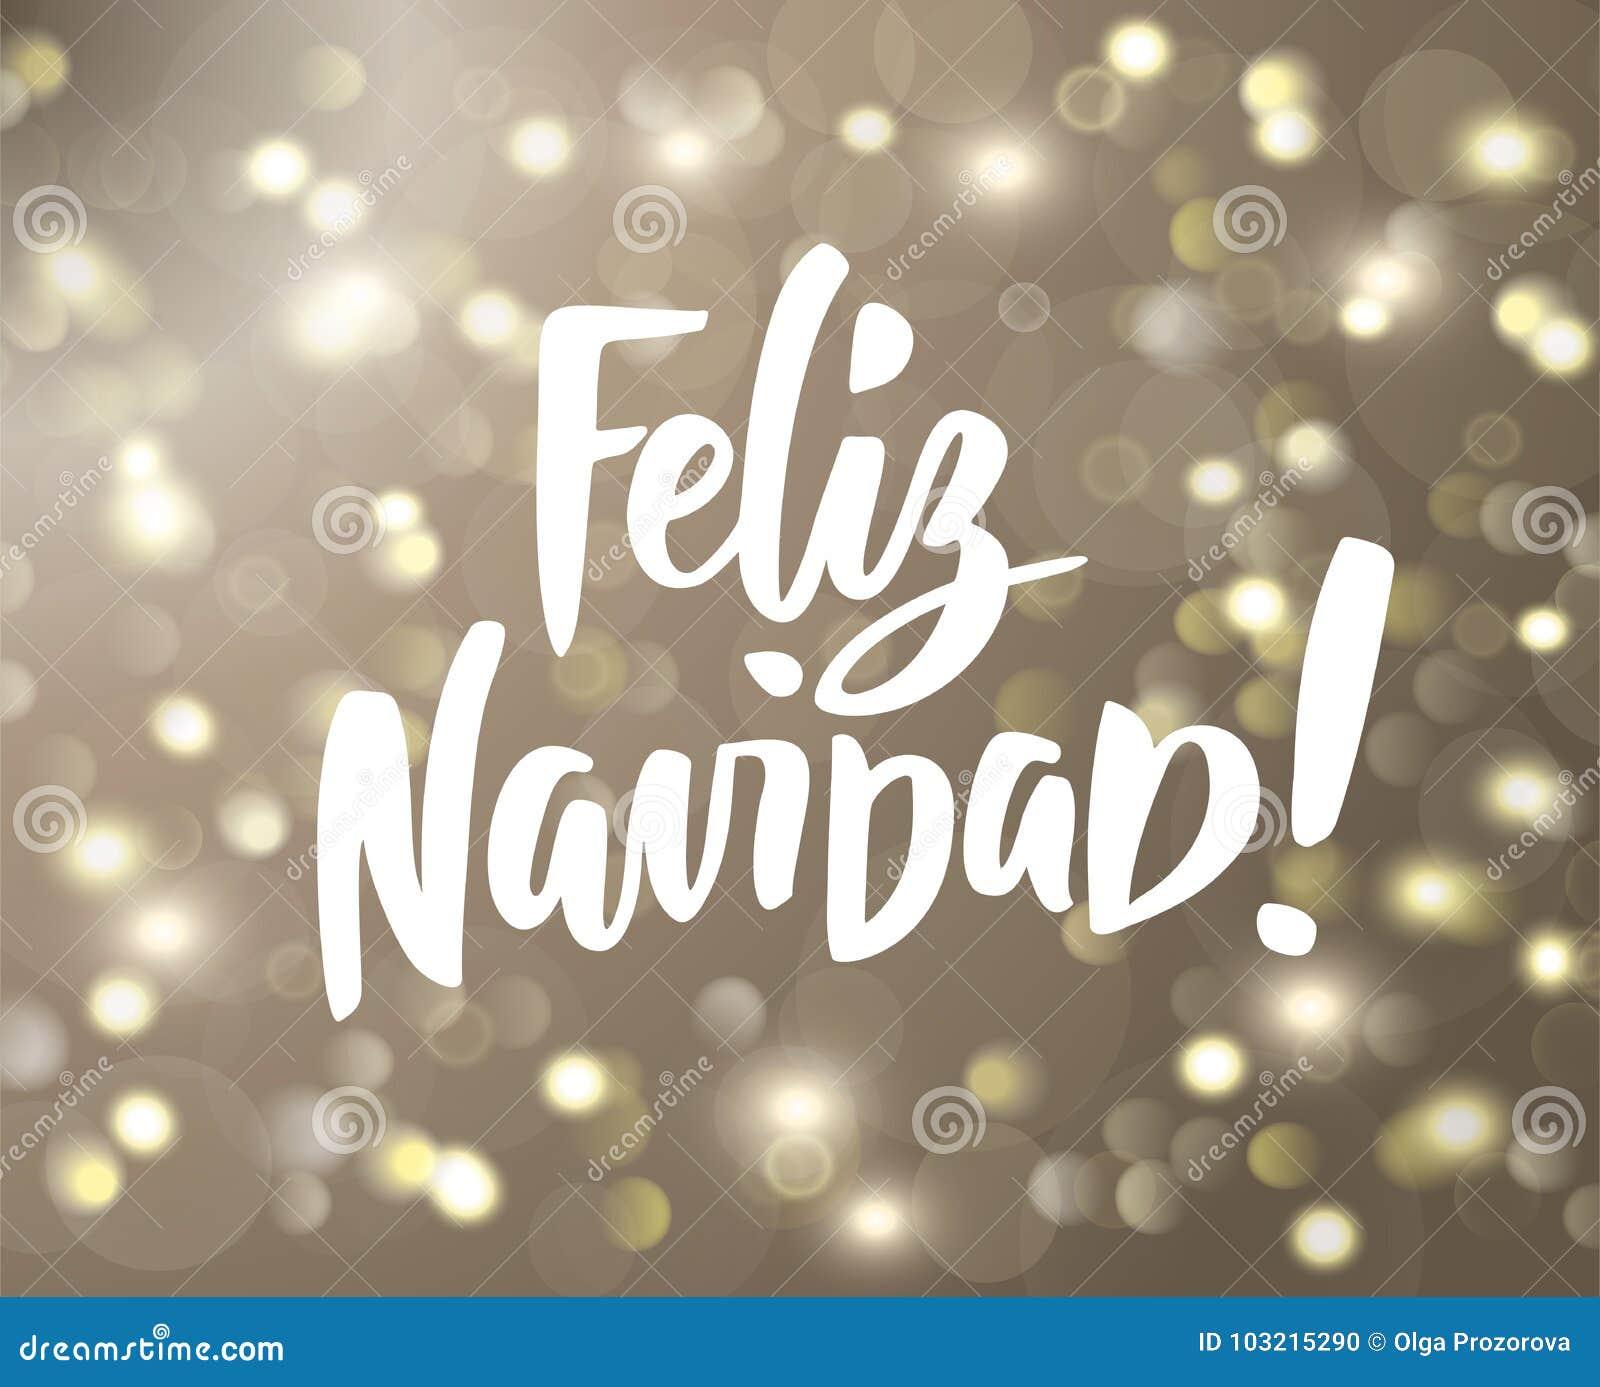 Feliz Navidad Text Holiday Greetings Spanish Quote Isolated On